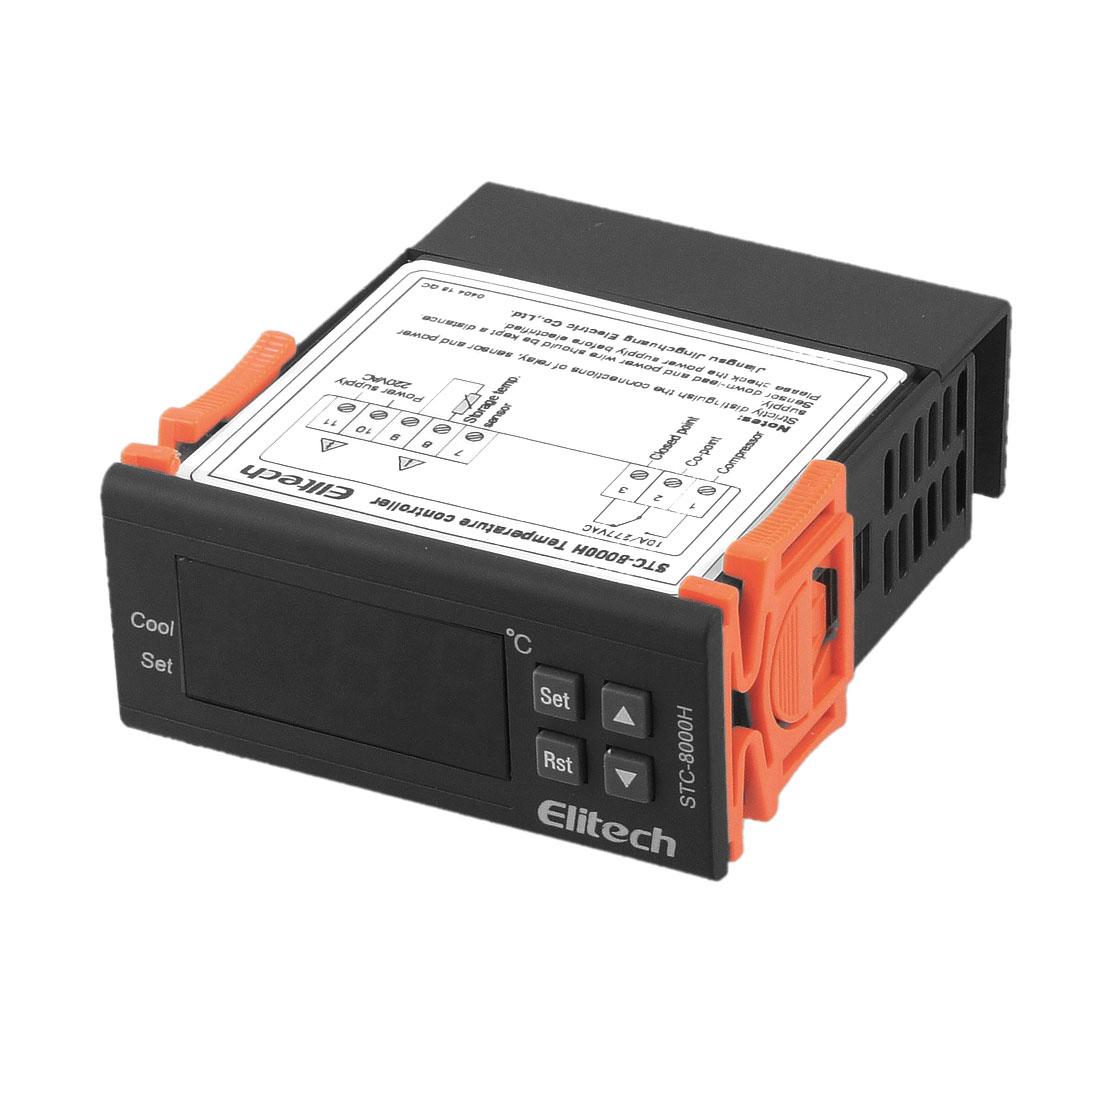 Microcomputer LCD Temperature Controller Thermostat w Probe Sensor Cable